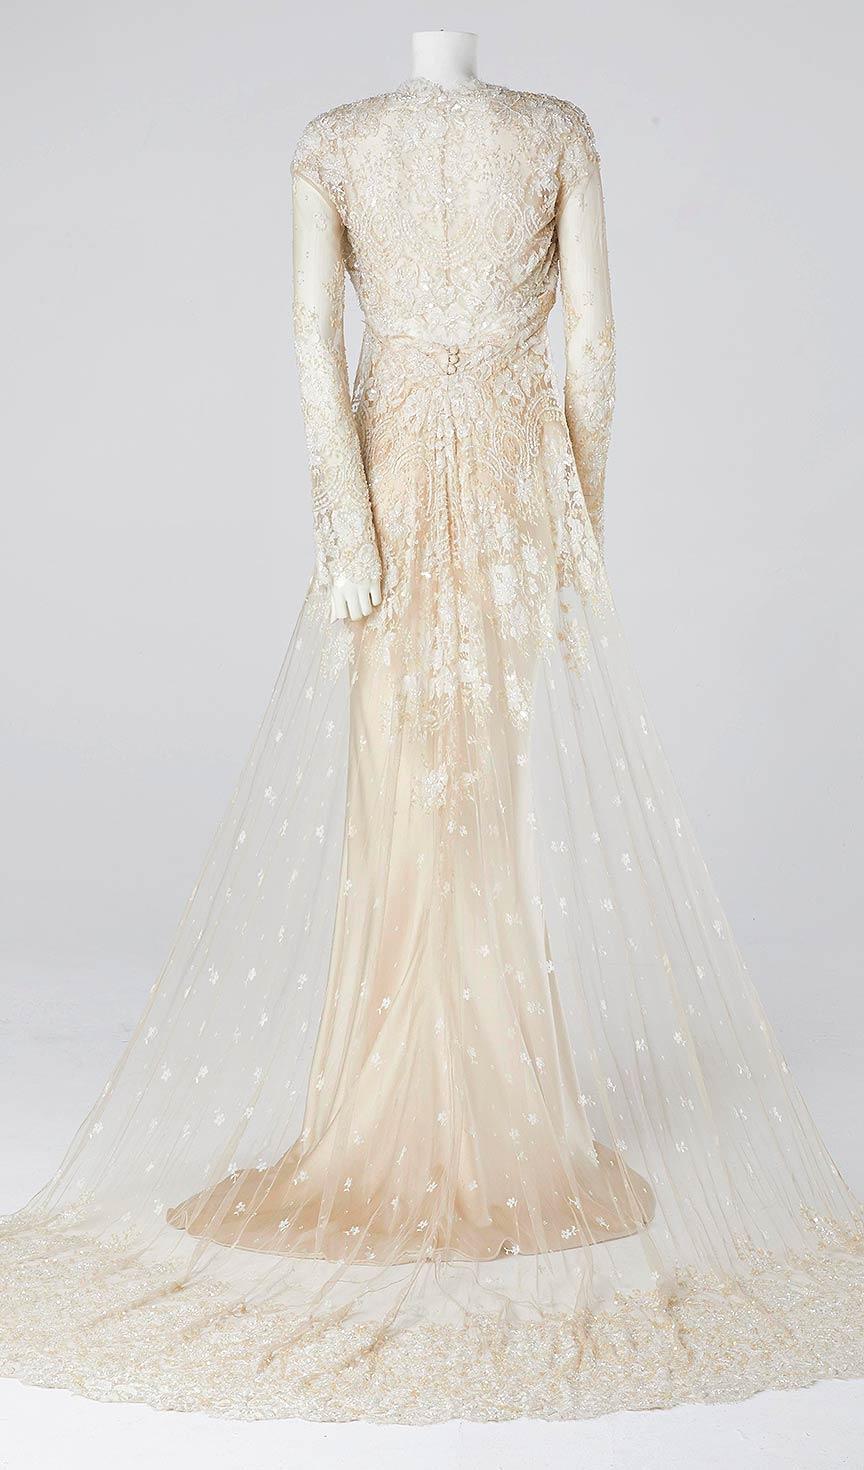 Satin Fishtail Wedding Dress : Couture designer of wedding dresses mother bride